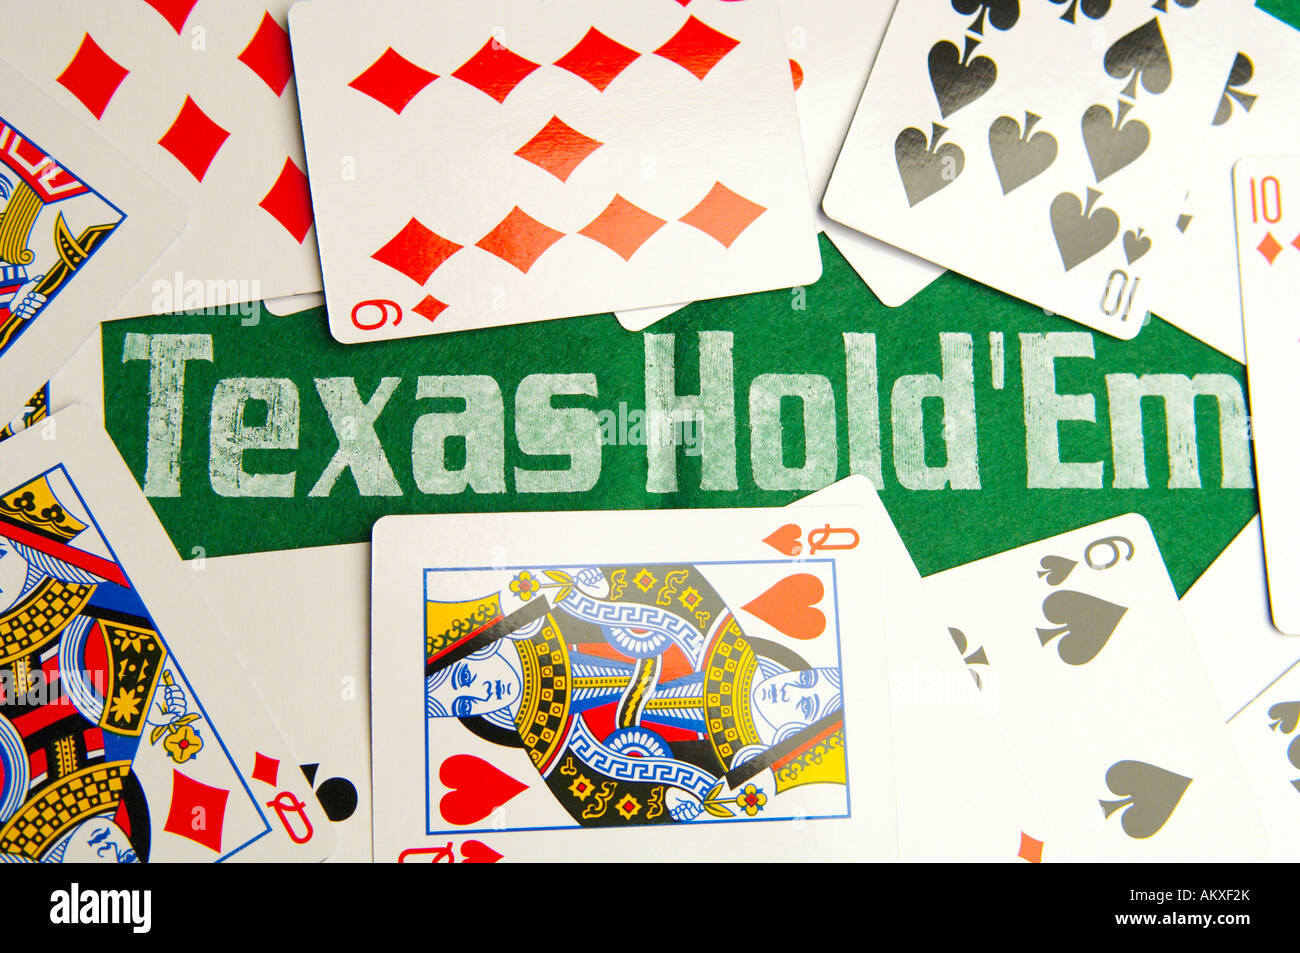 Texas Hold'em Poker Game - Stock Image